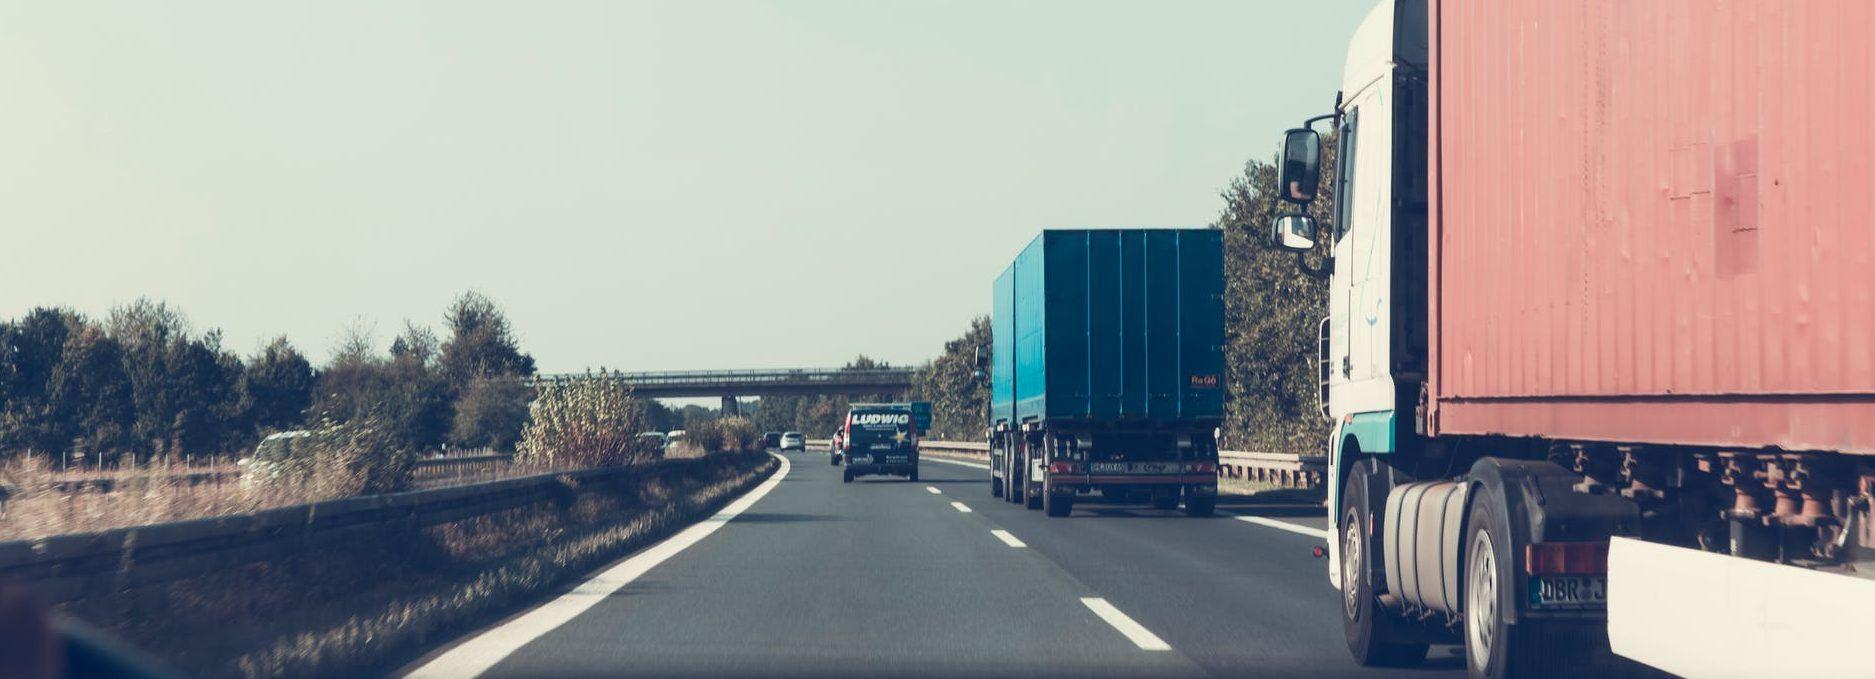 SA-FMS transport logistics software | Logistics tracking solutions Africa